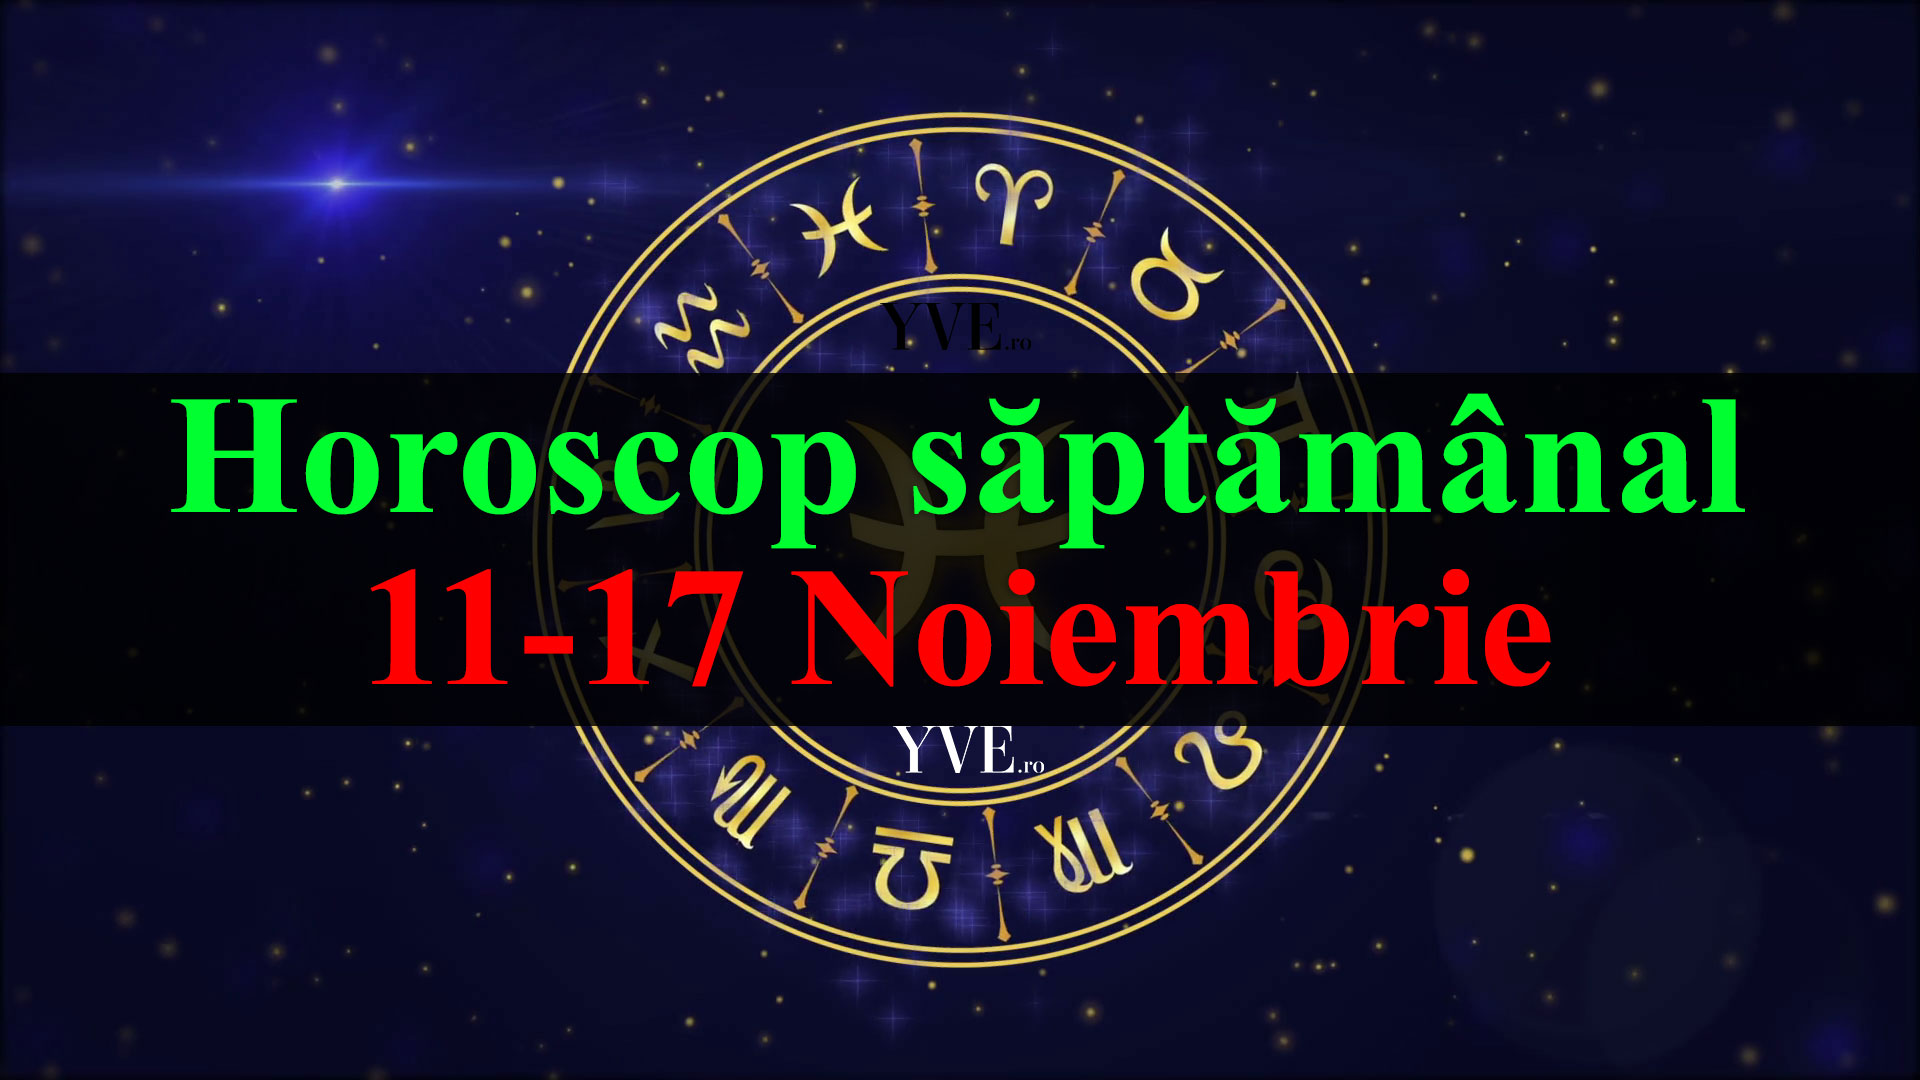 Horoscop saptamanal 11-17 Noiembrie 2019